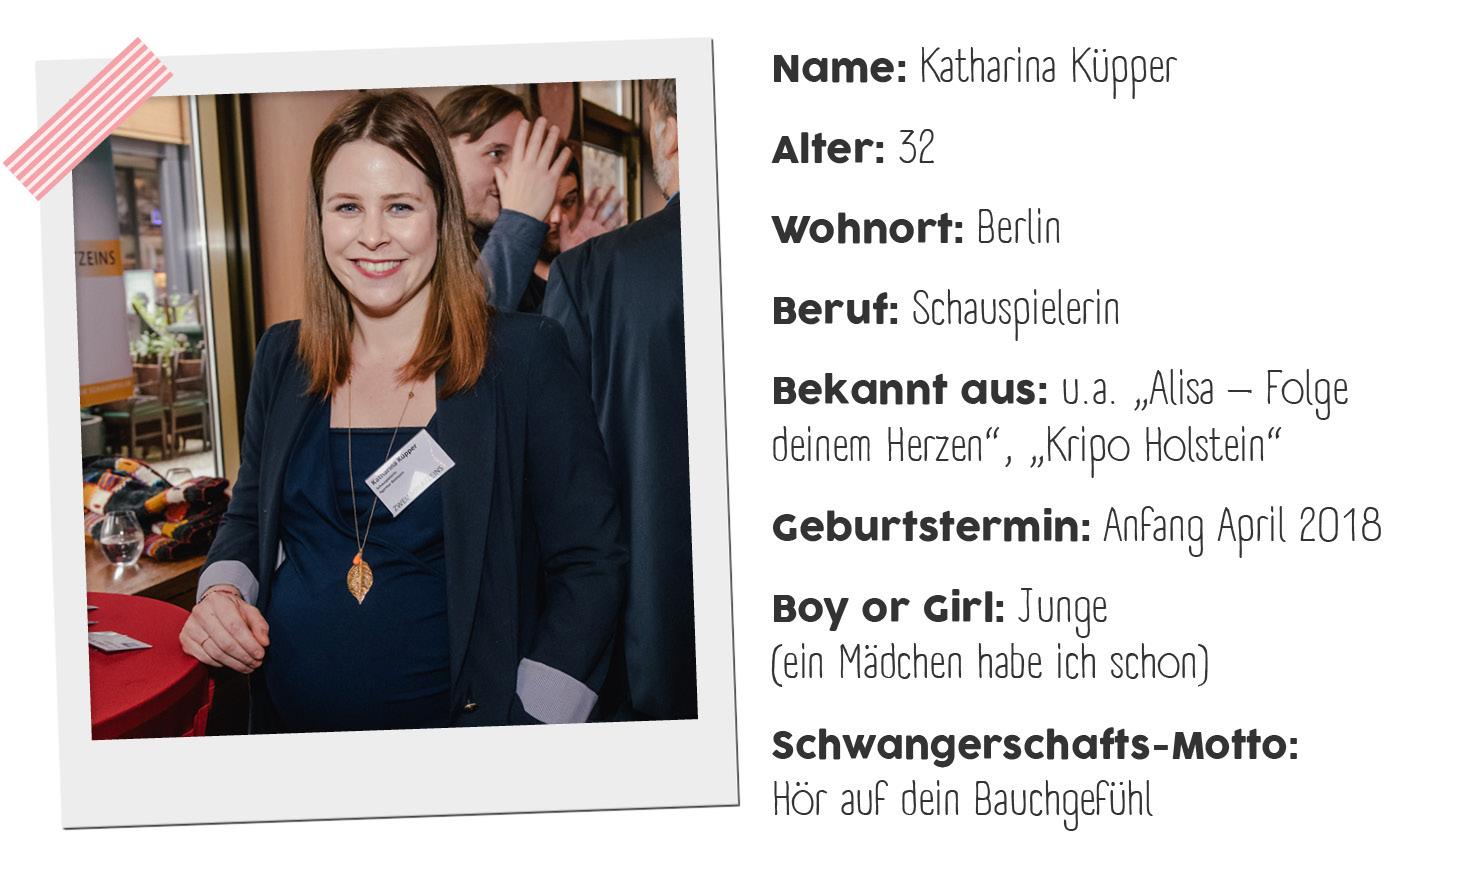 Katharina_Küpper_Alter_Umstandsmode_Mamarella_Berlinale